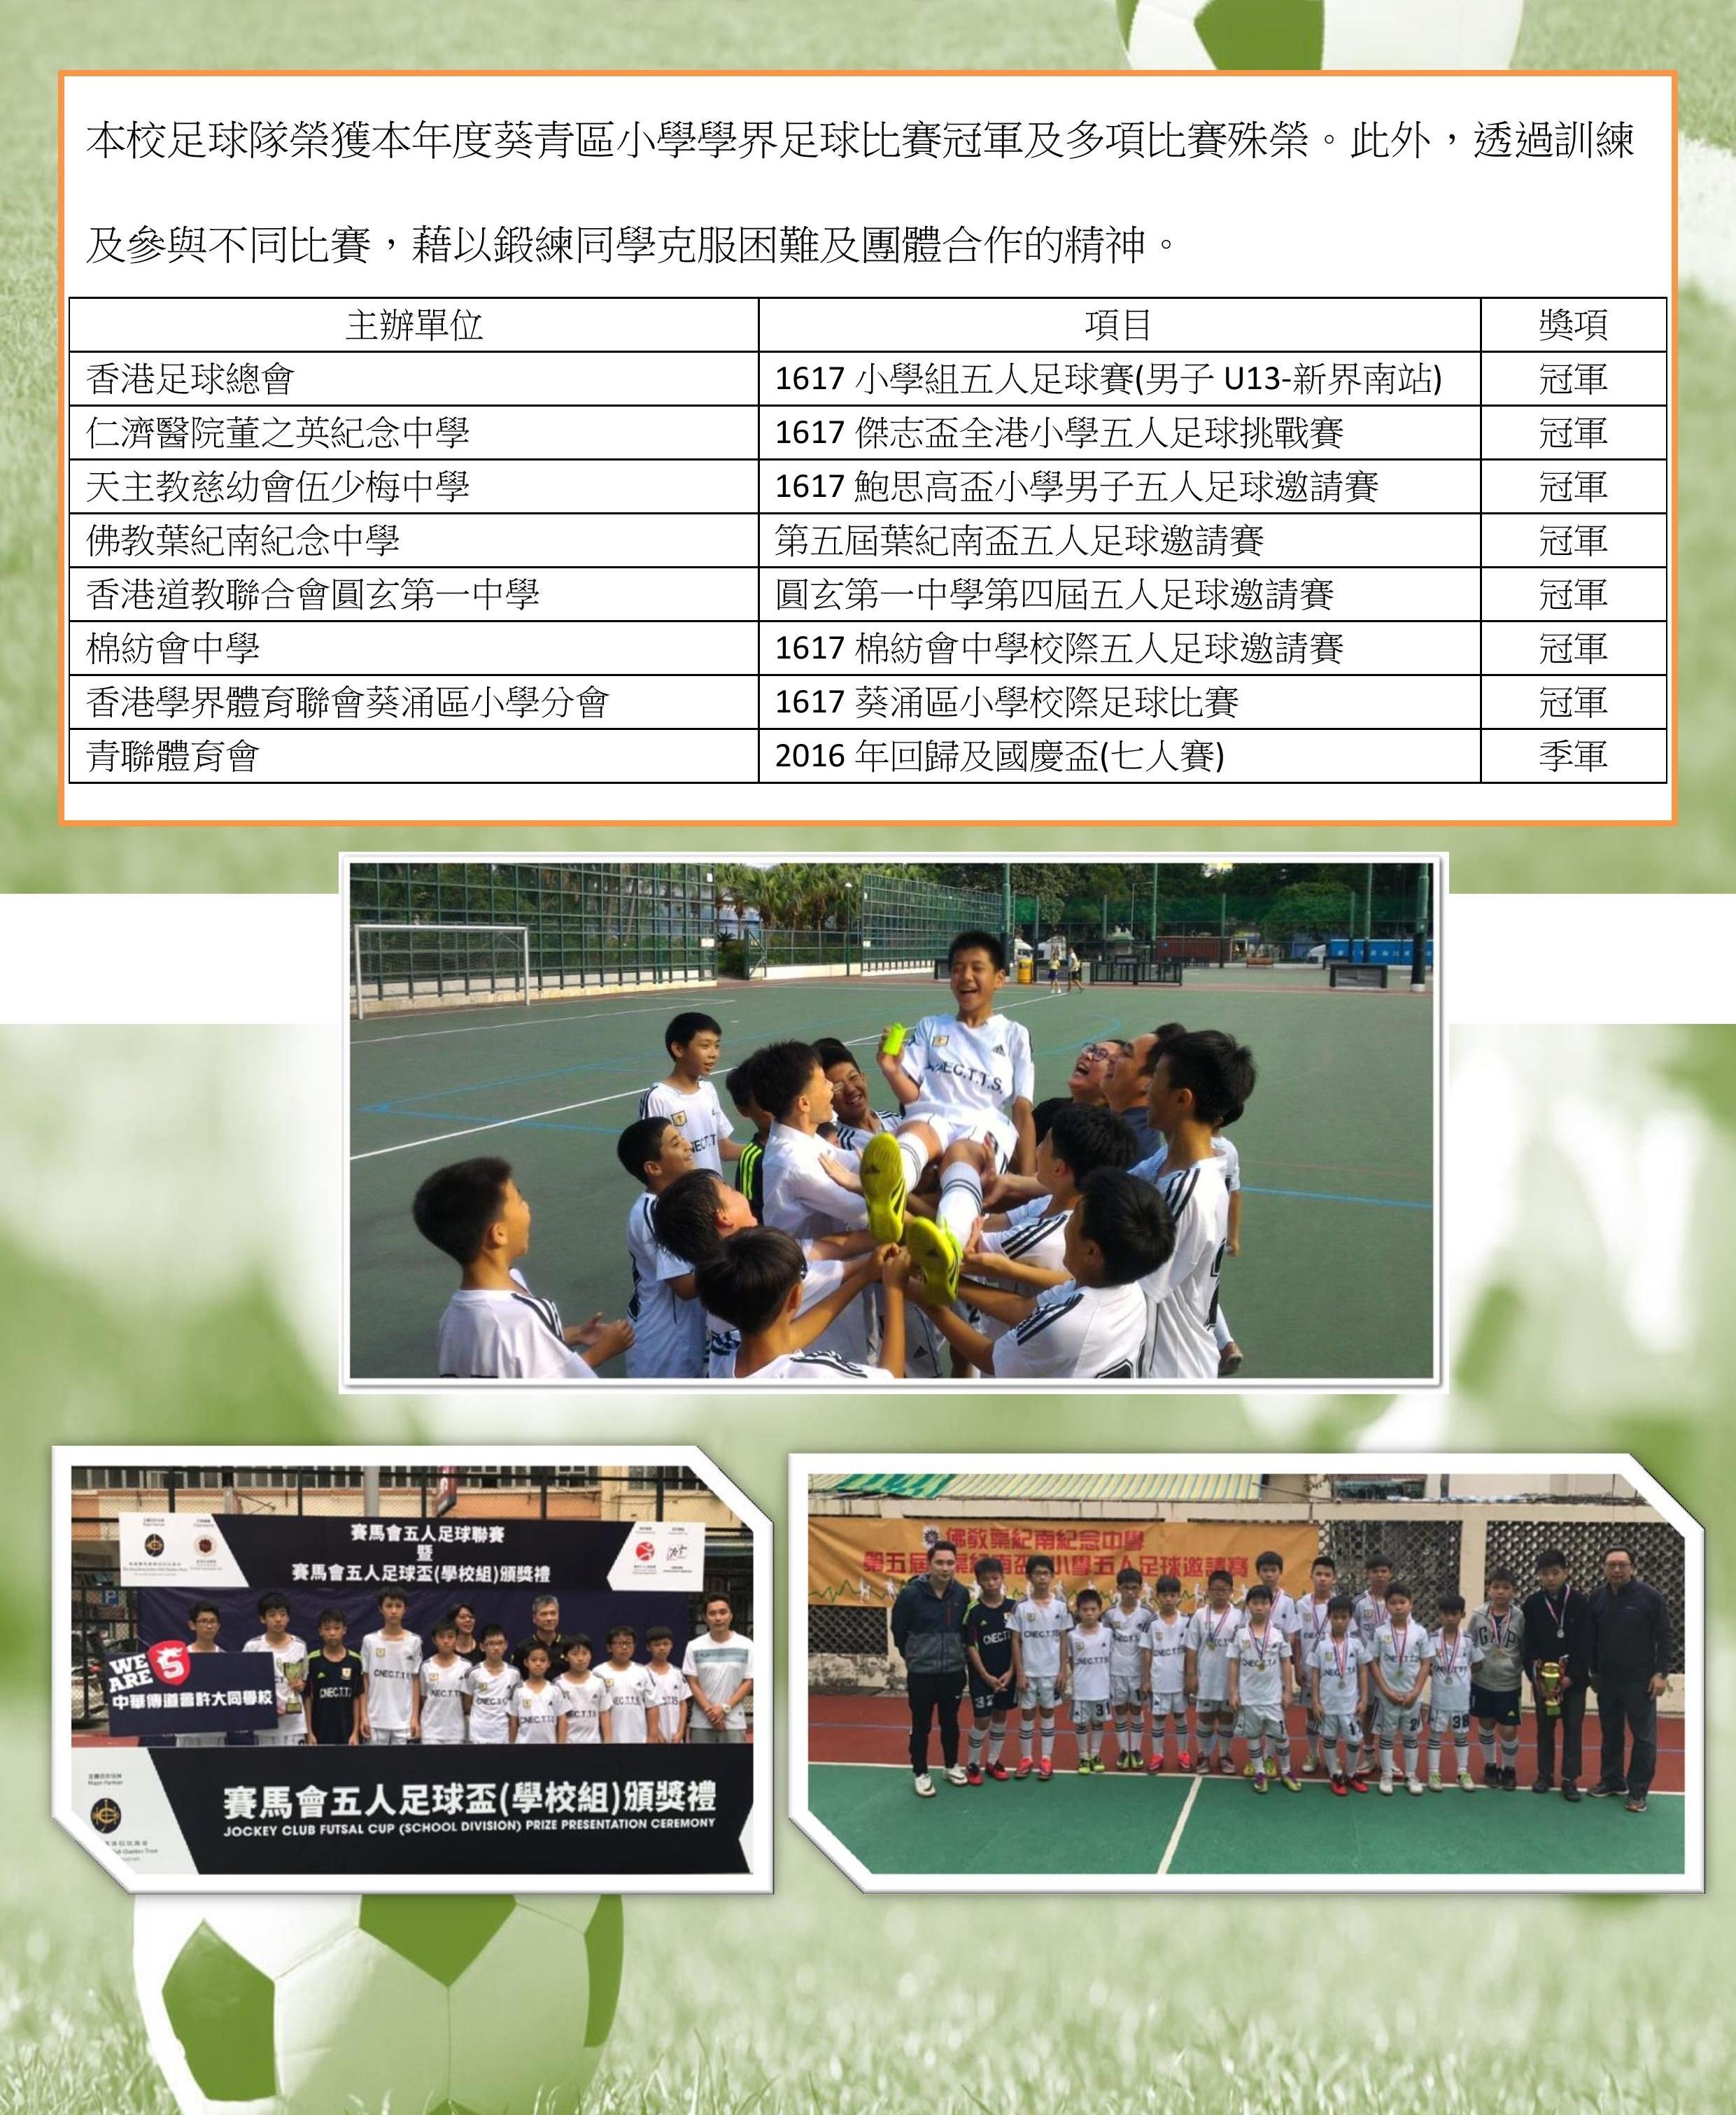 FOOTBALLPRIZE1.jpg